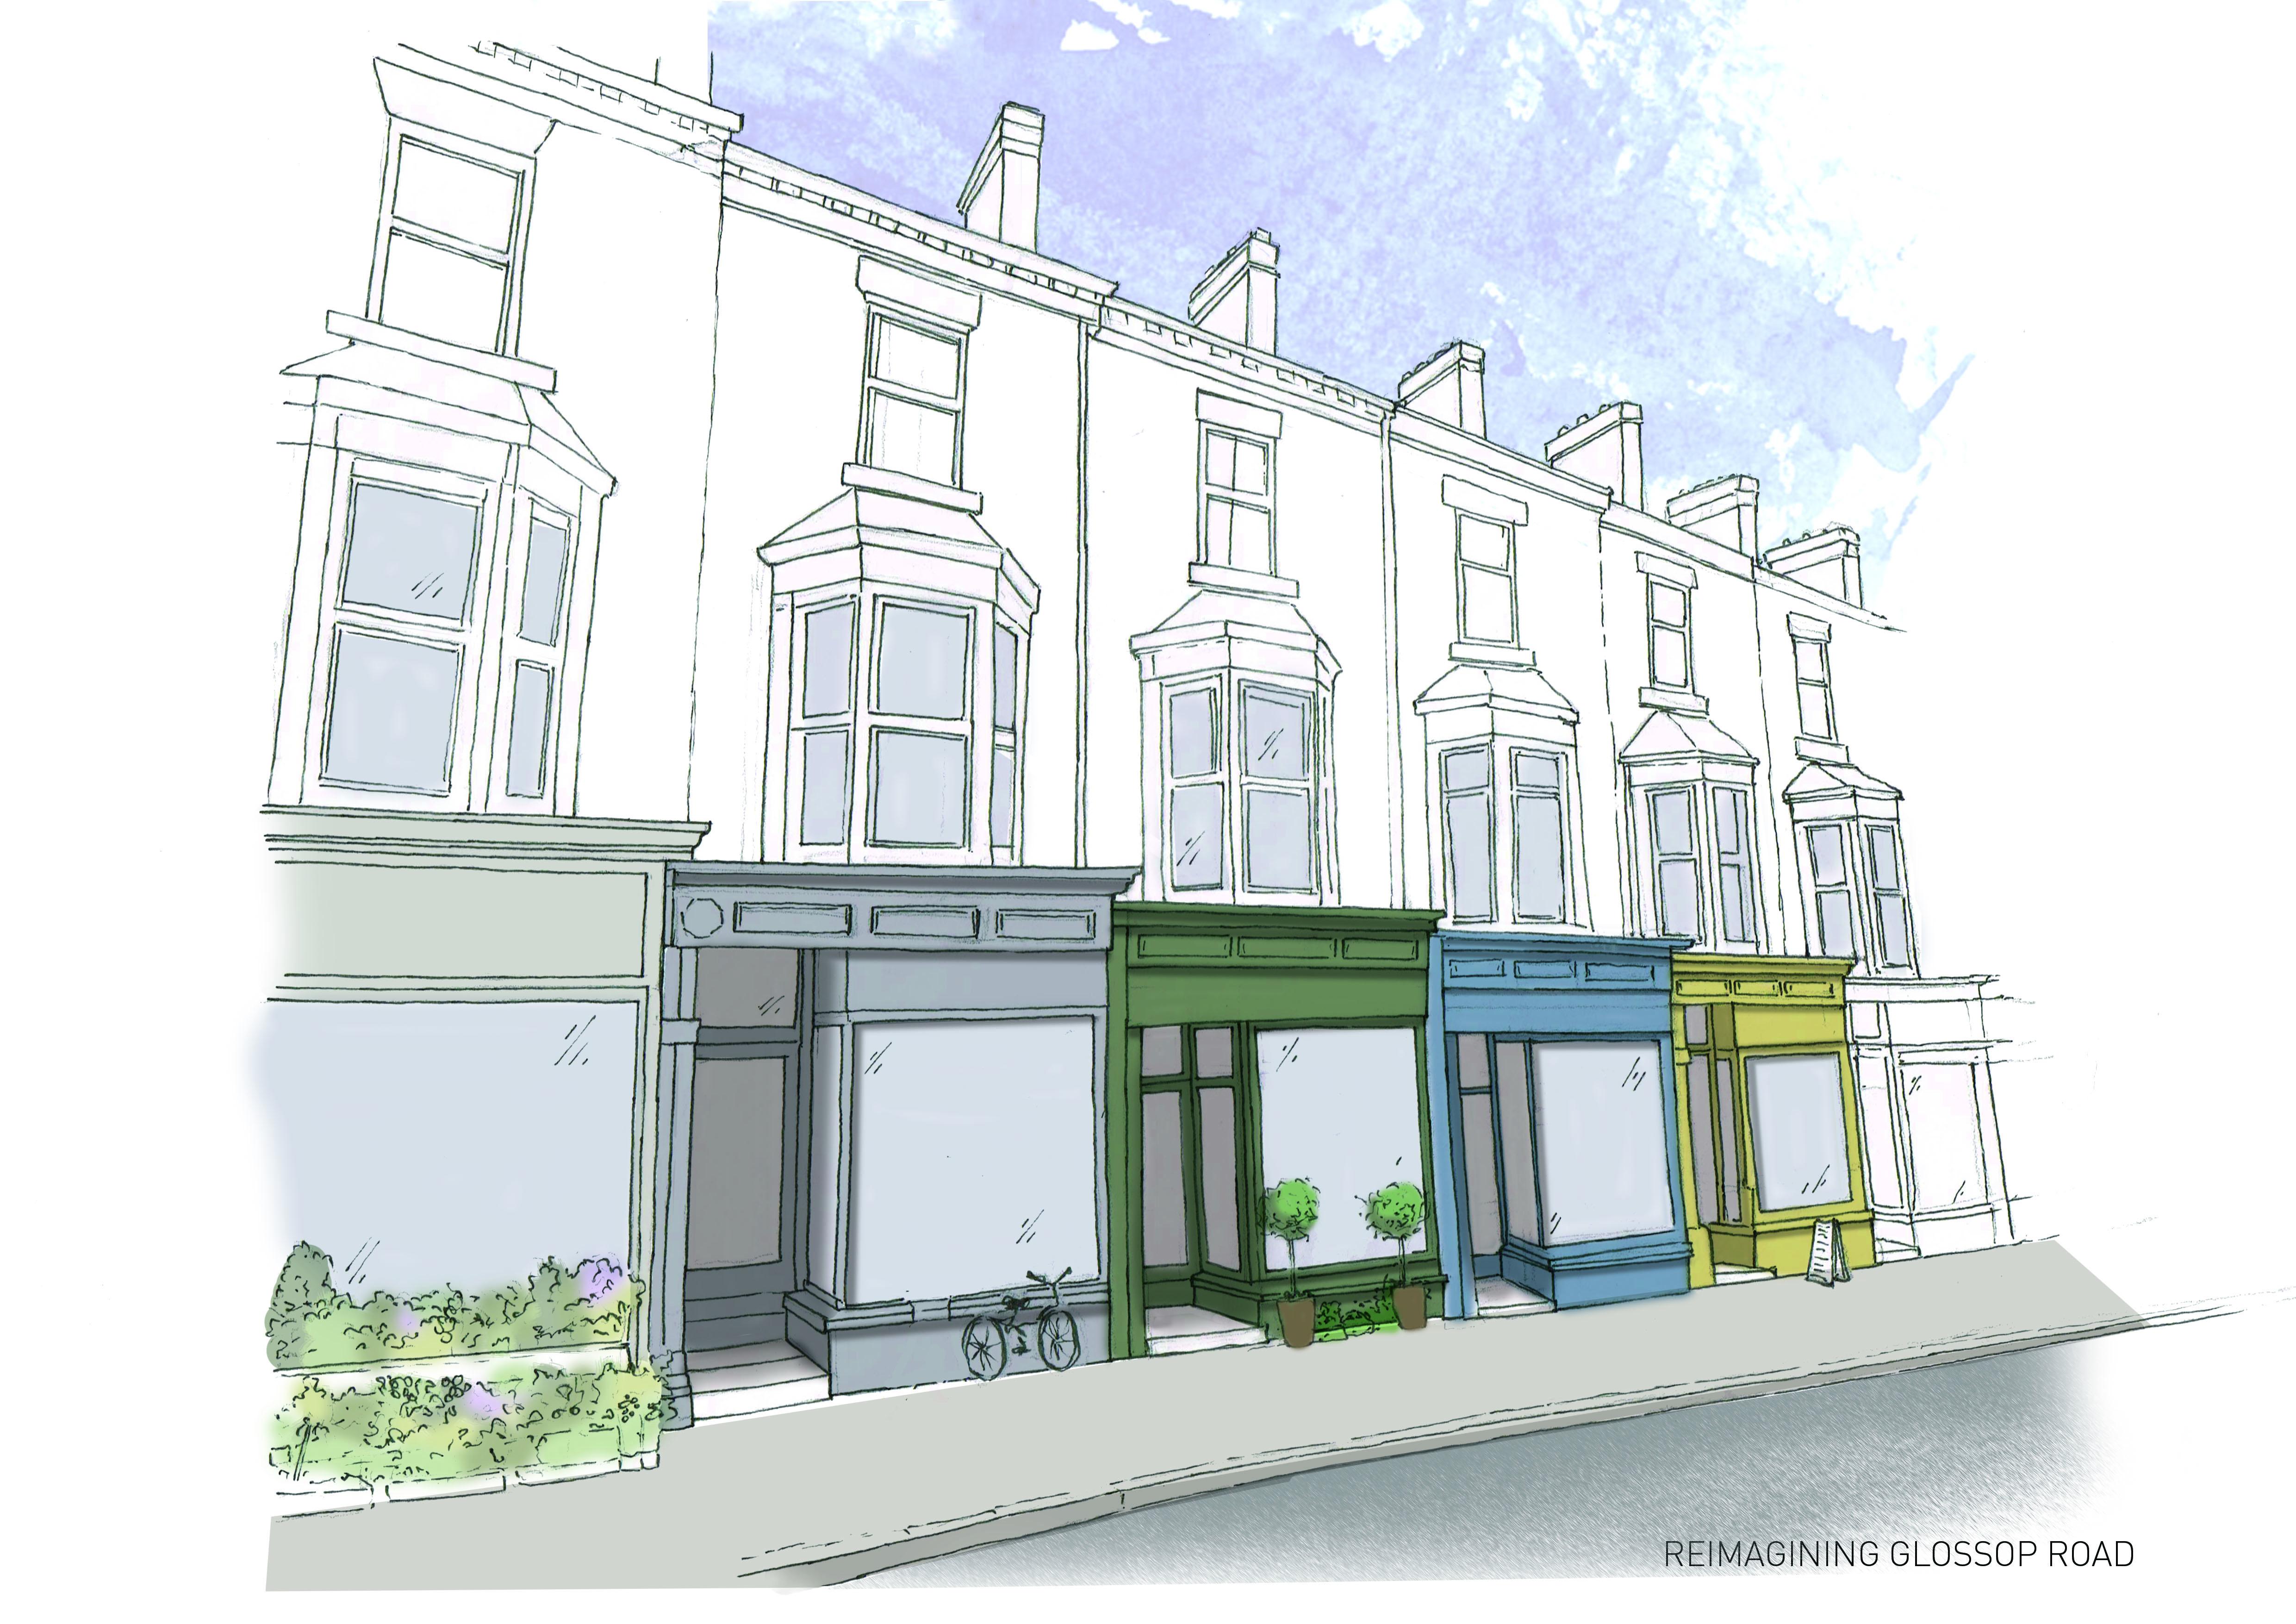 Re-imagining Glossop Road